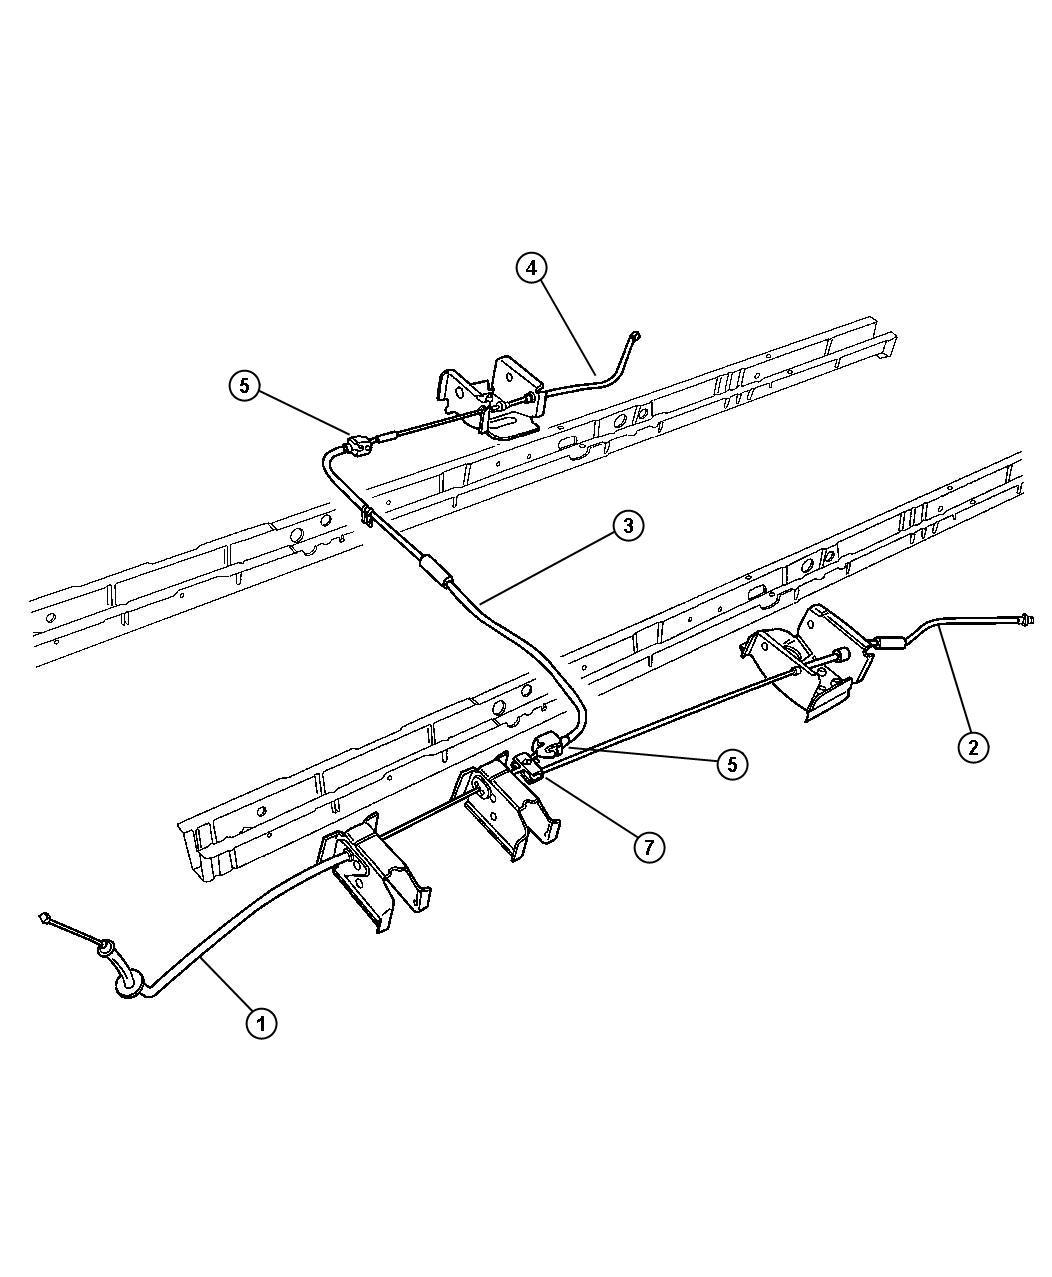 Dodge caravan rear drum brake diagram on chrysler town and country suspension diagram